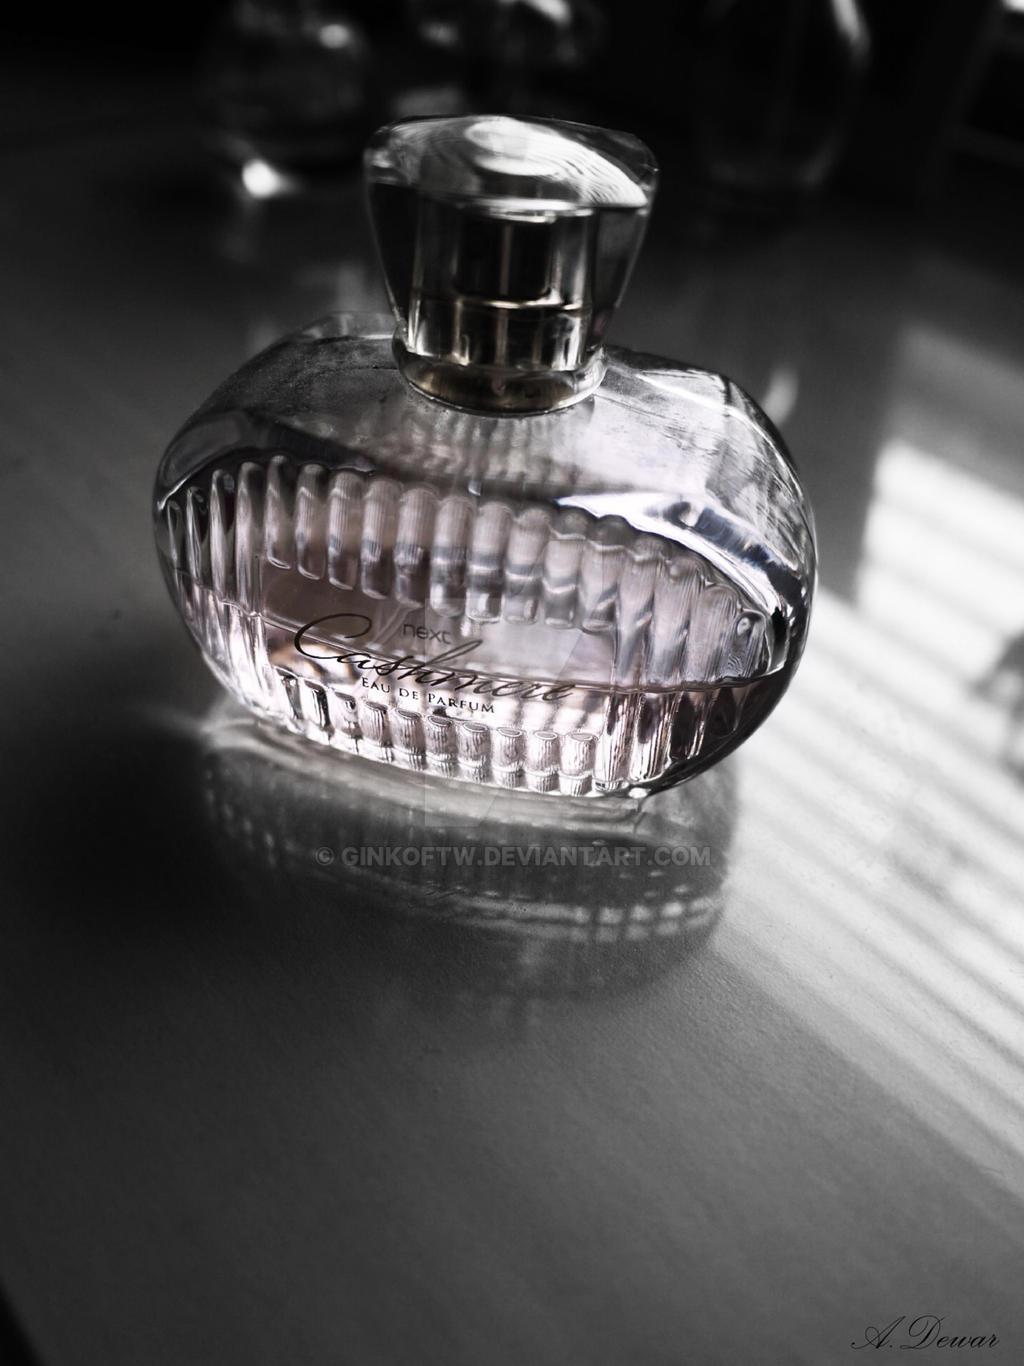 perfume by Ginkoftw